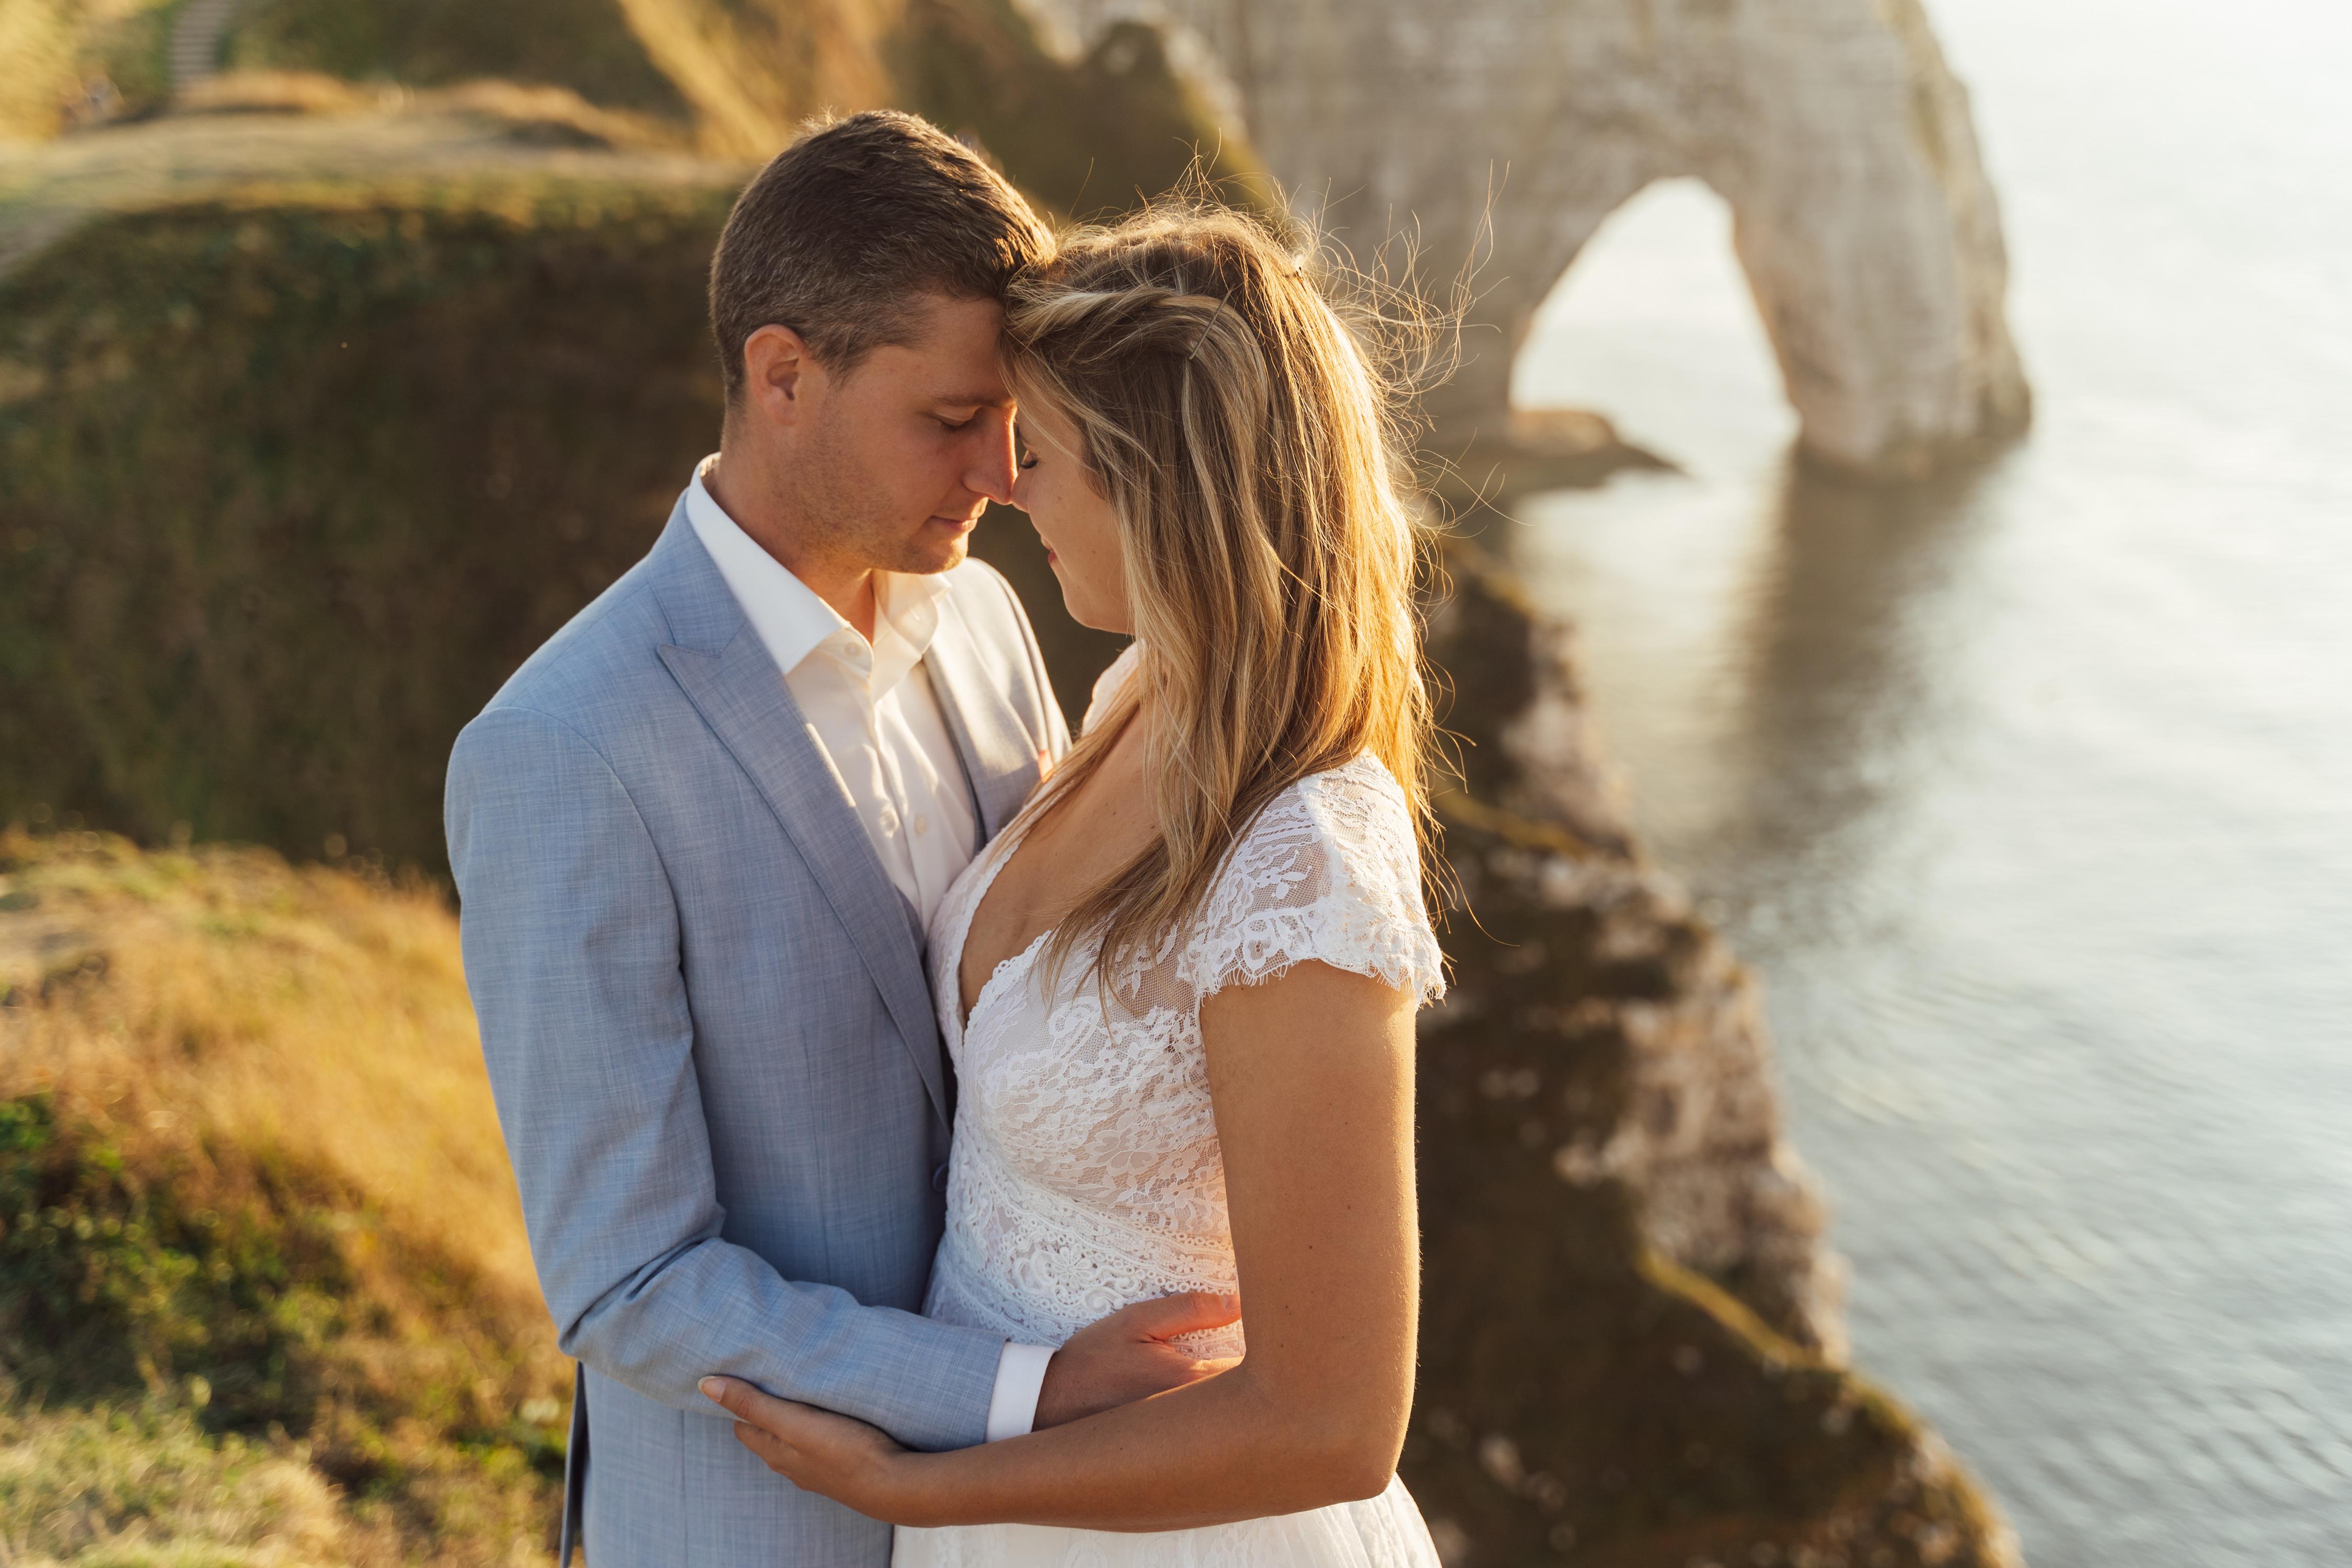 photographe de mariage Nicolas Peeters